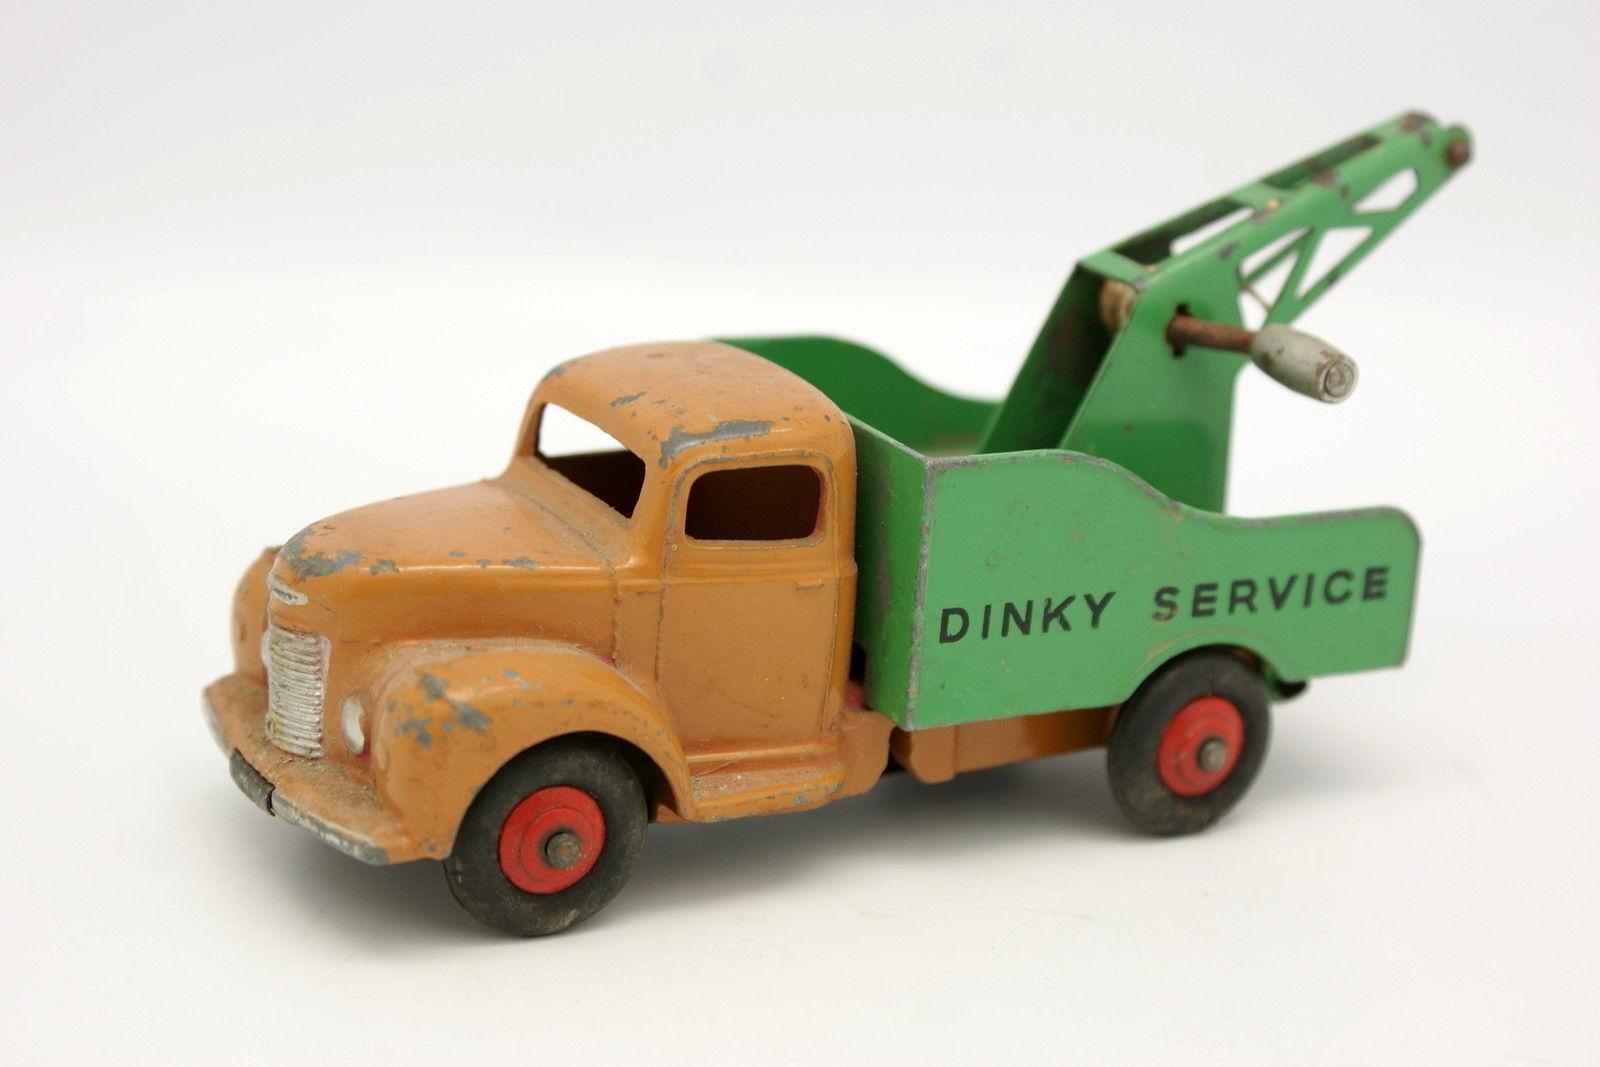 Dinky Toys GB 1 43 - Commer Commer Commer Carro de remolque dinky Estación de a02fc7